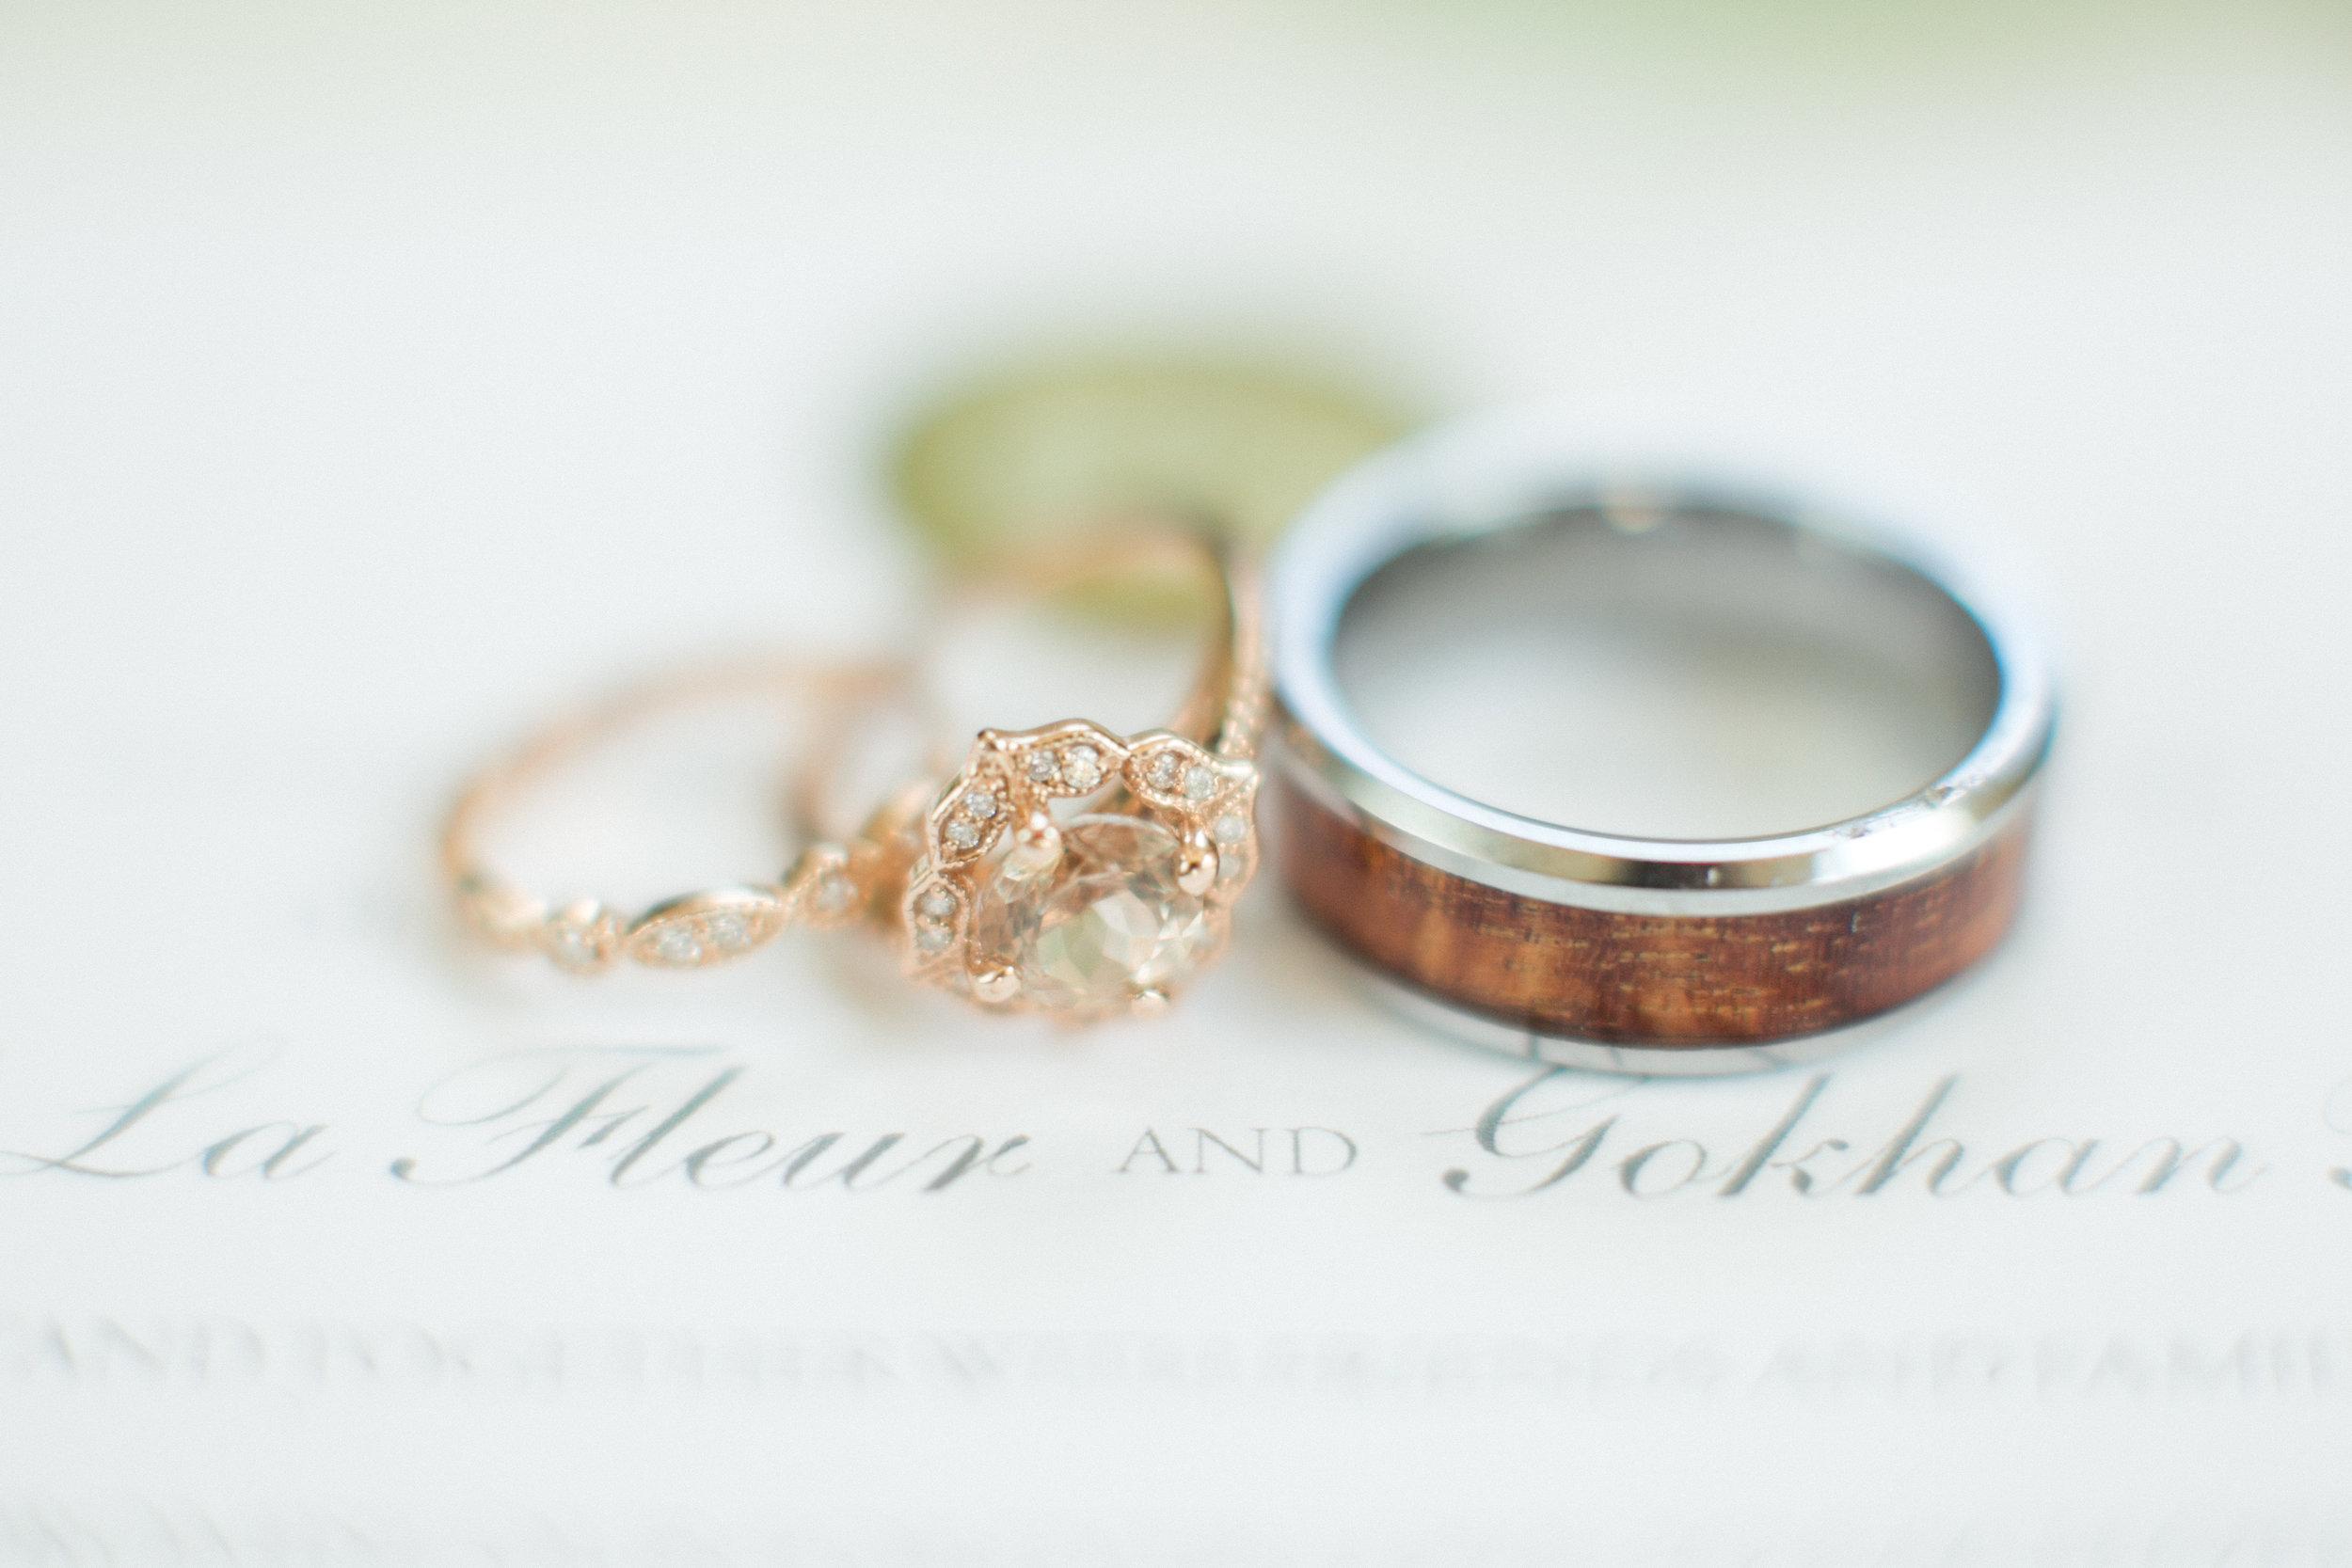 www.santabarbarawedding.com | Atelier de La Fleur Weddings & Events | Mike Larson | Wedding Rings